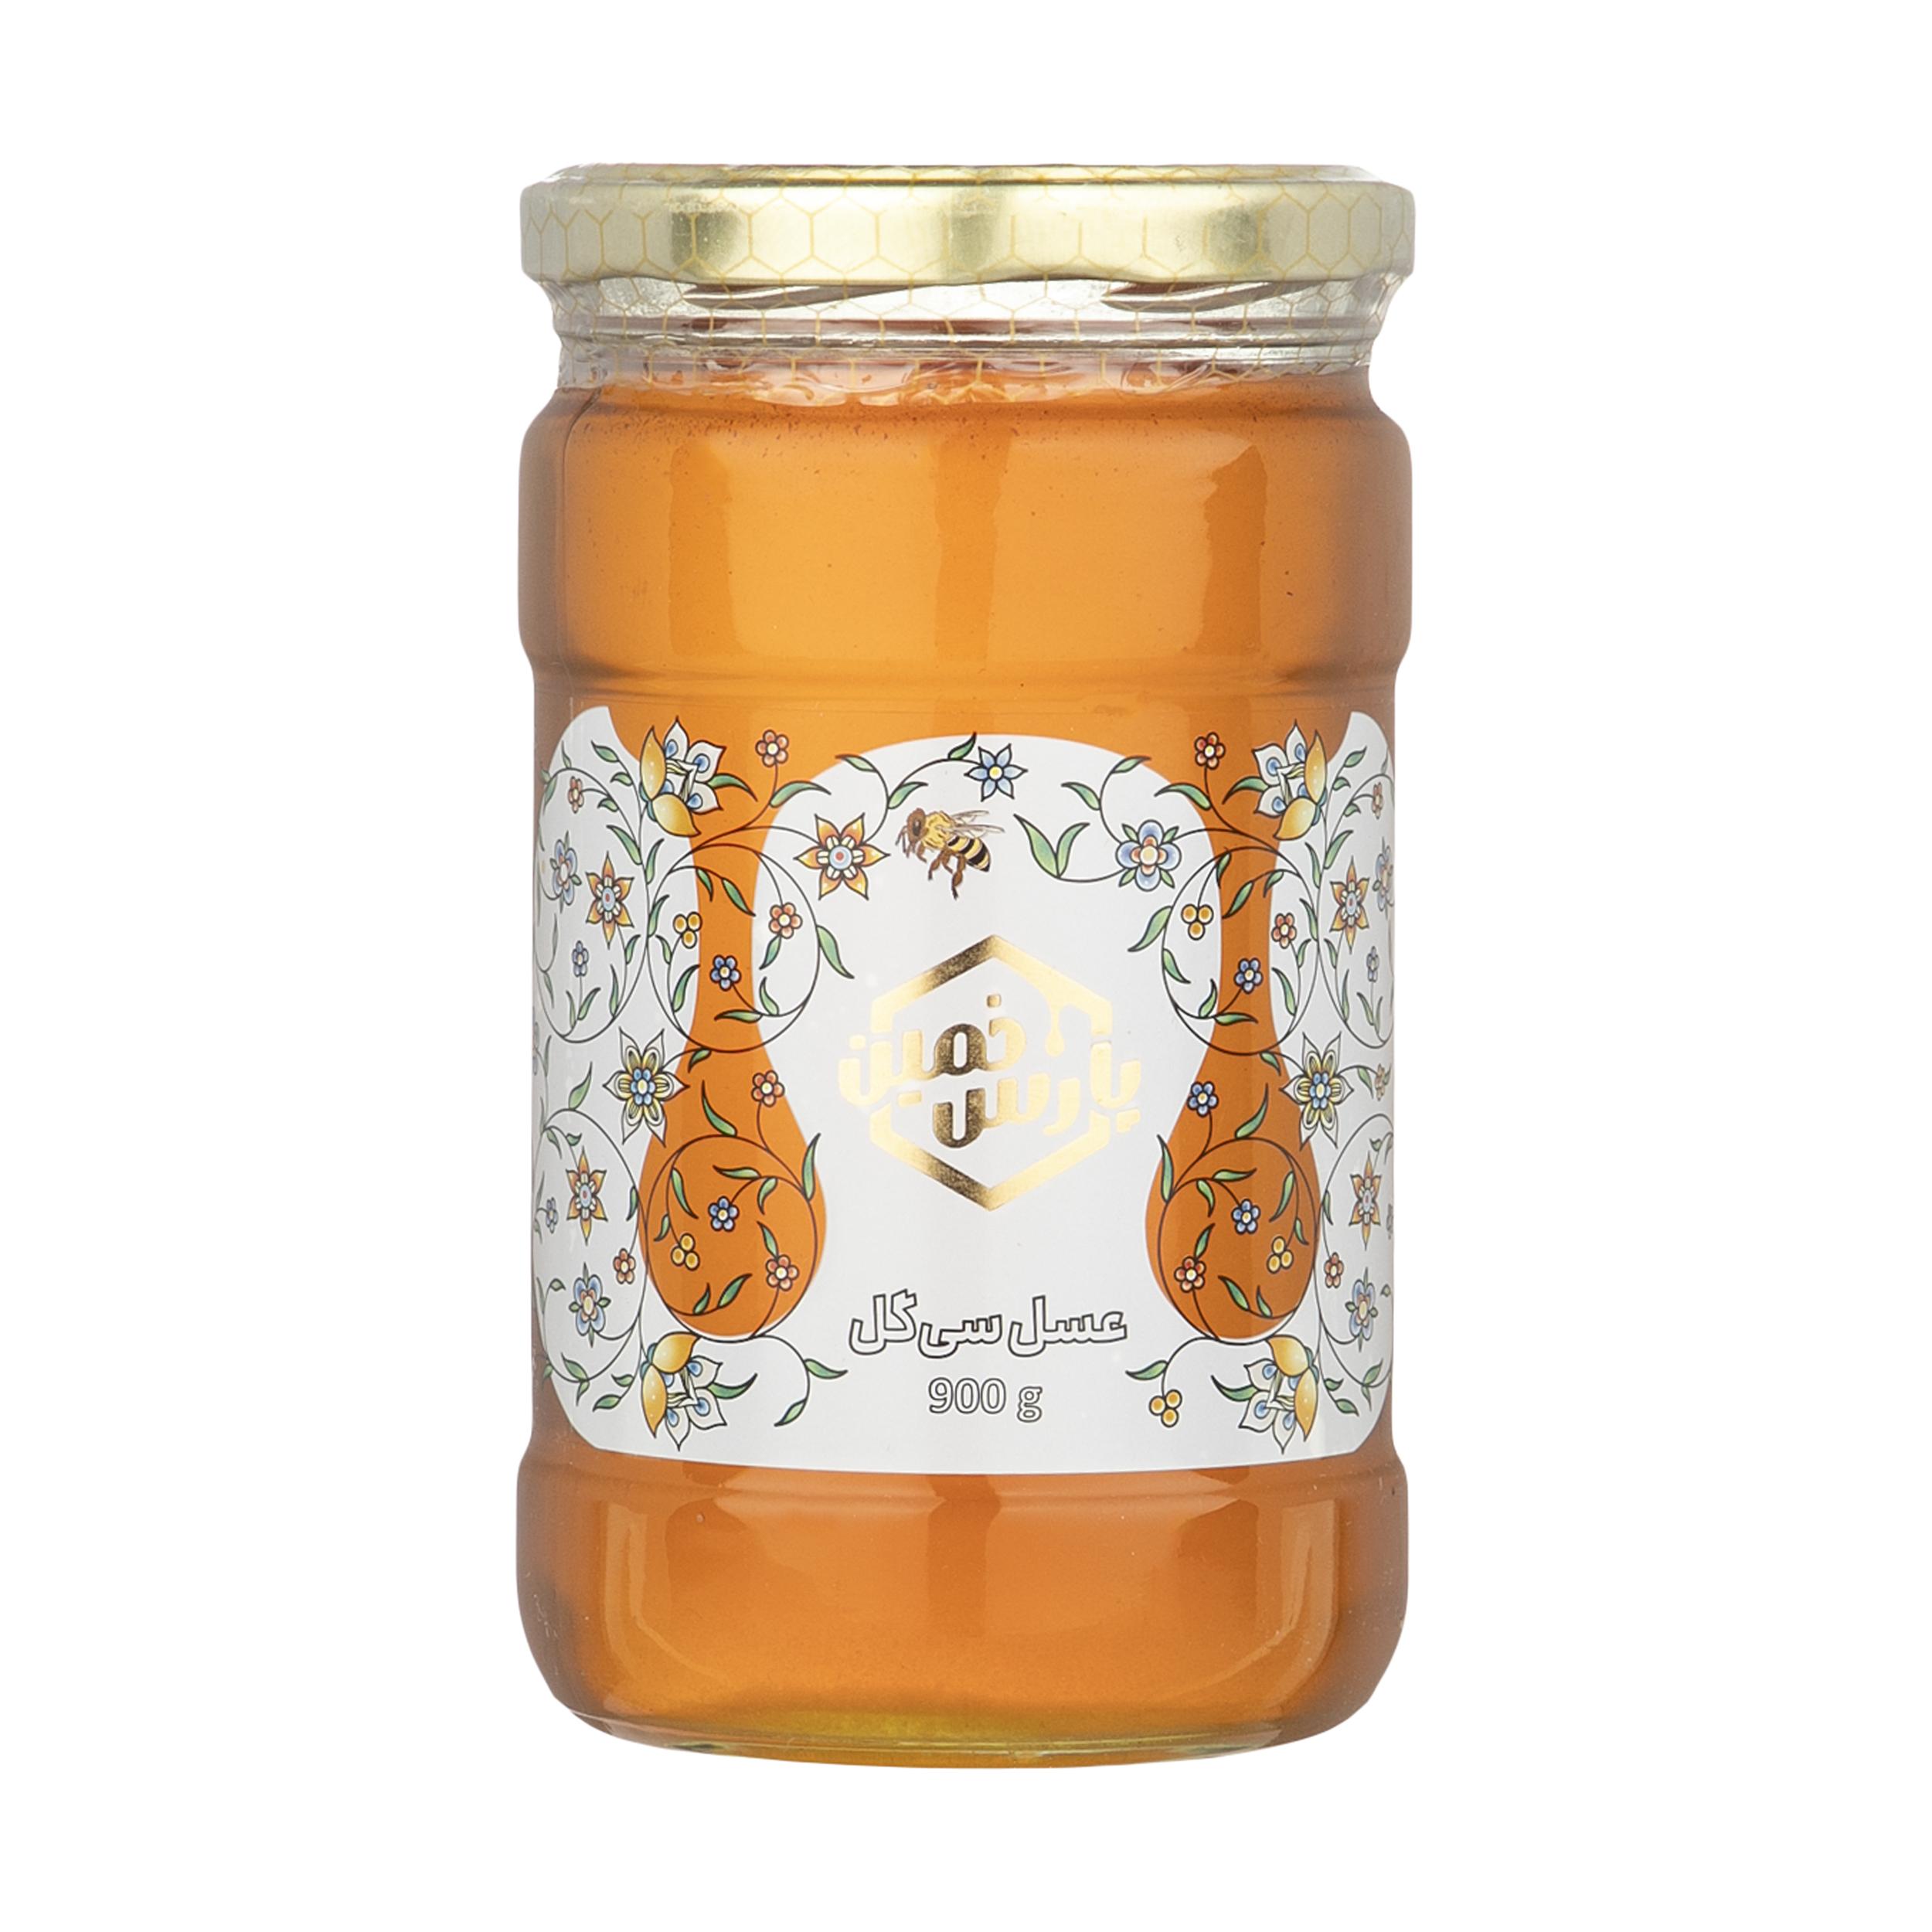 عسل سی گل پارس خمین - 900 گرم